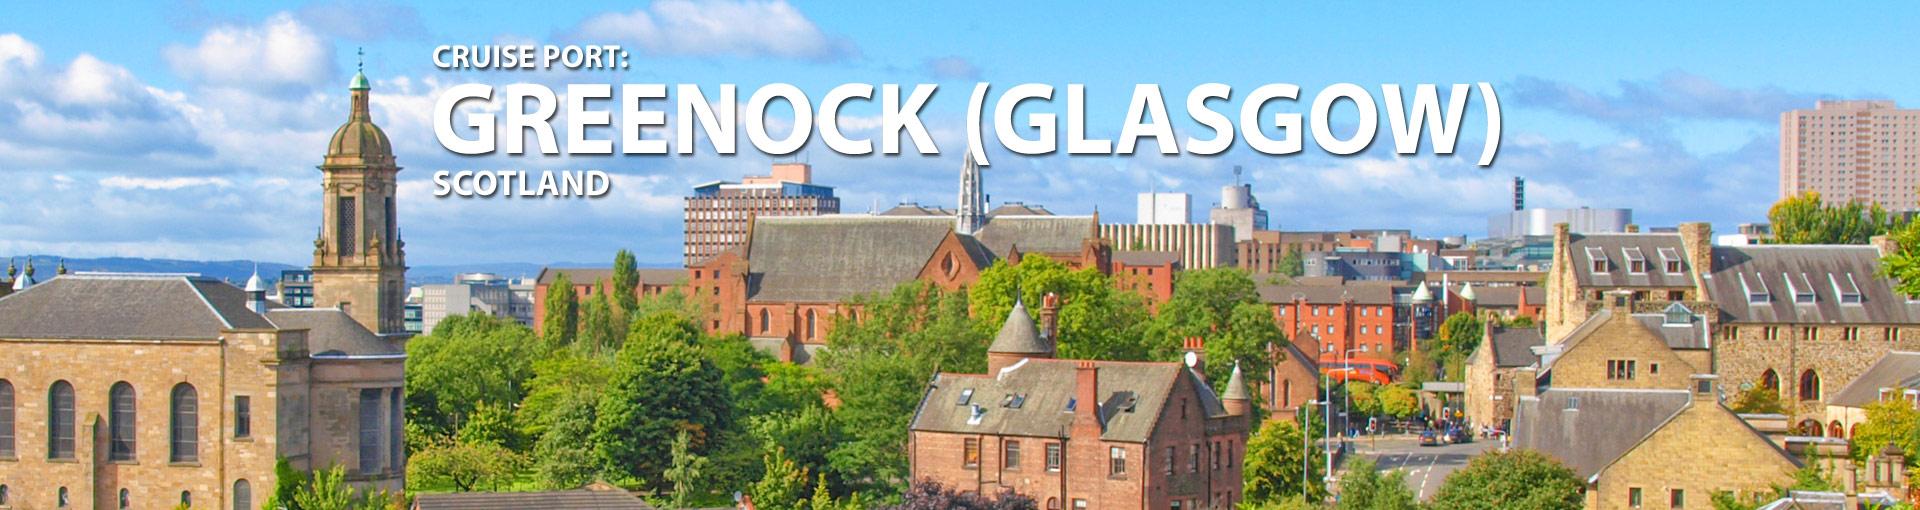 Cruises from Greenock, Glasgow, Scotland